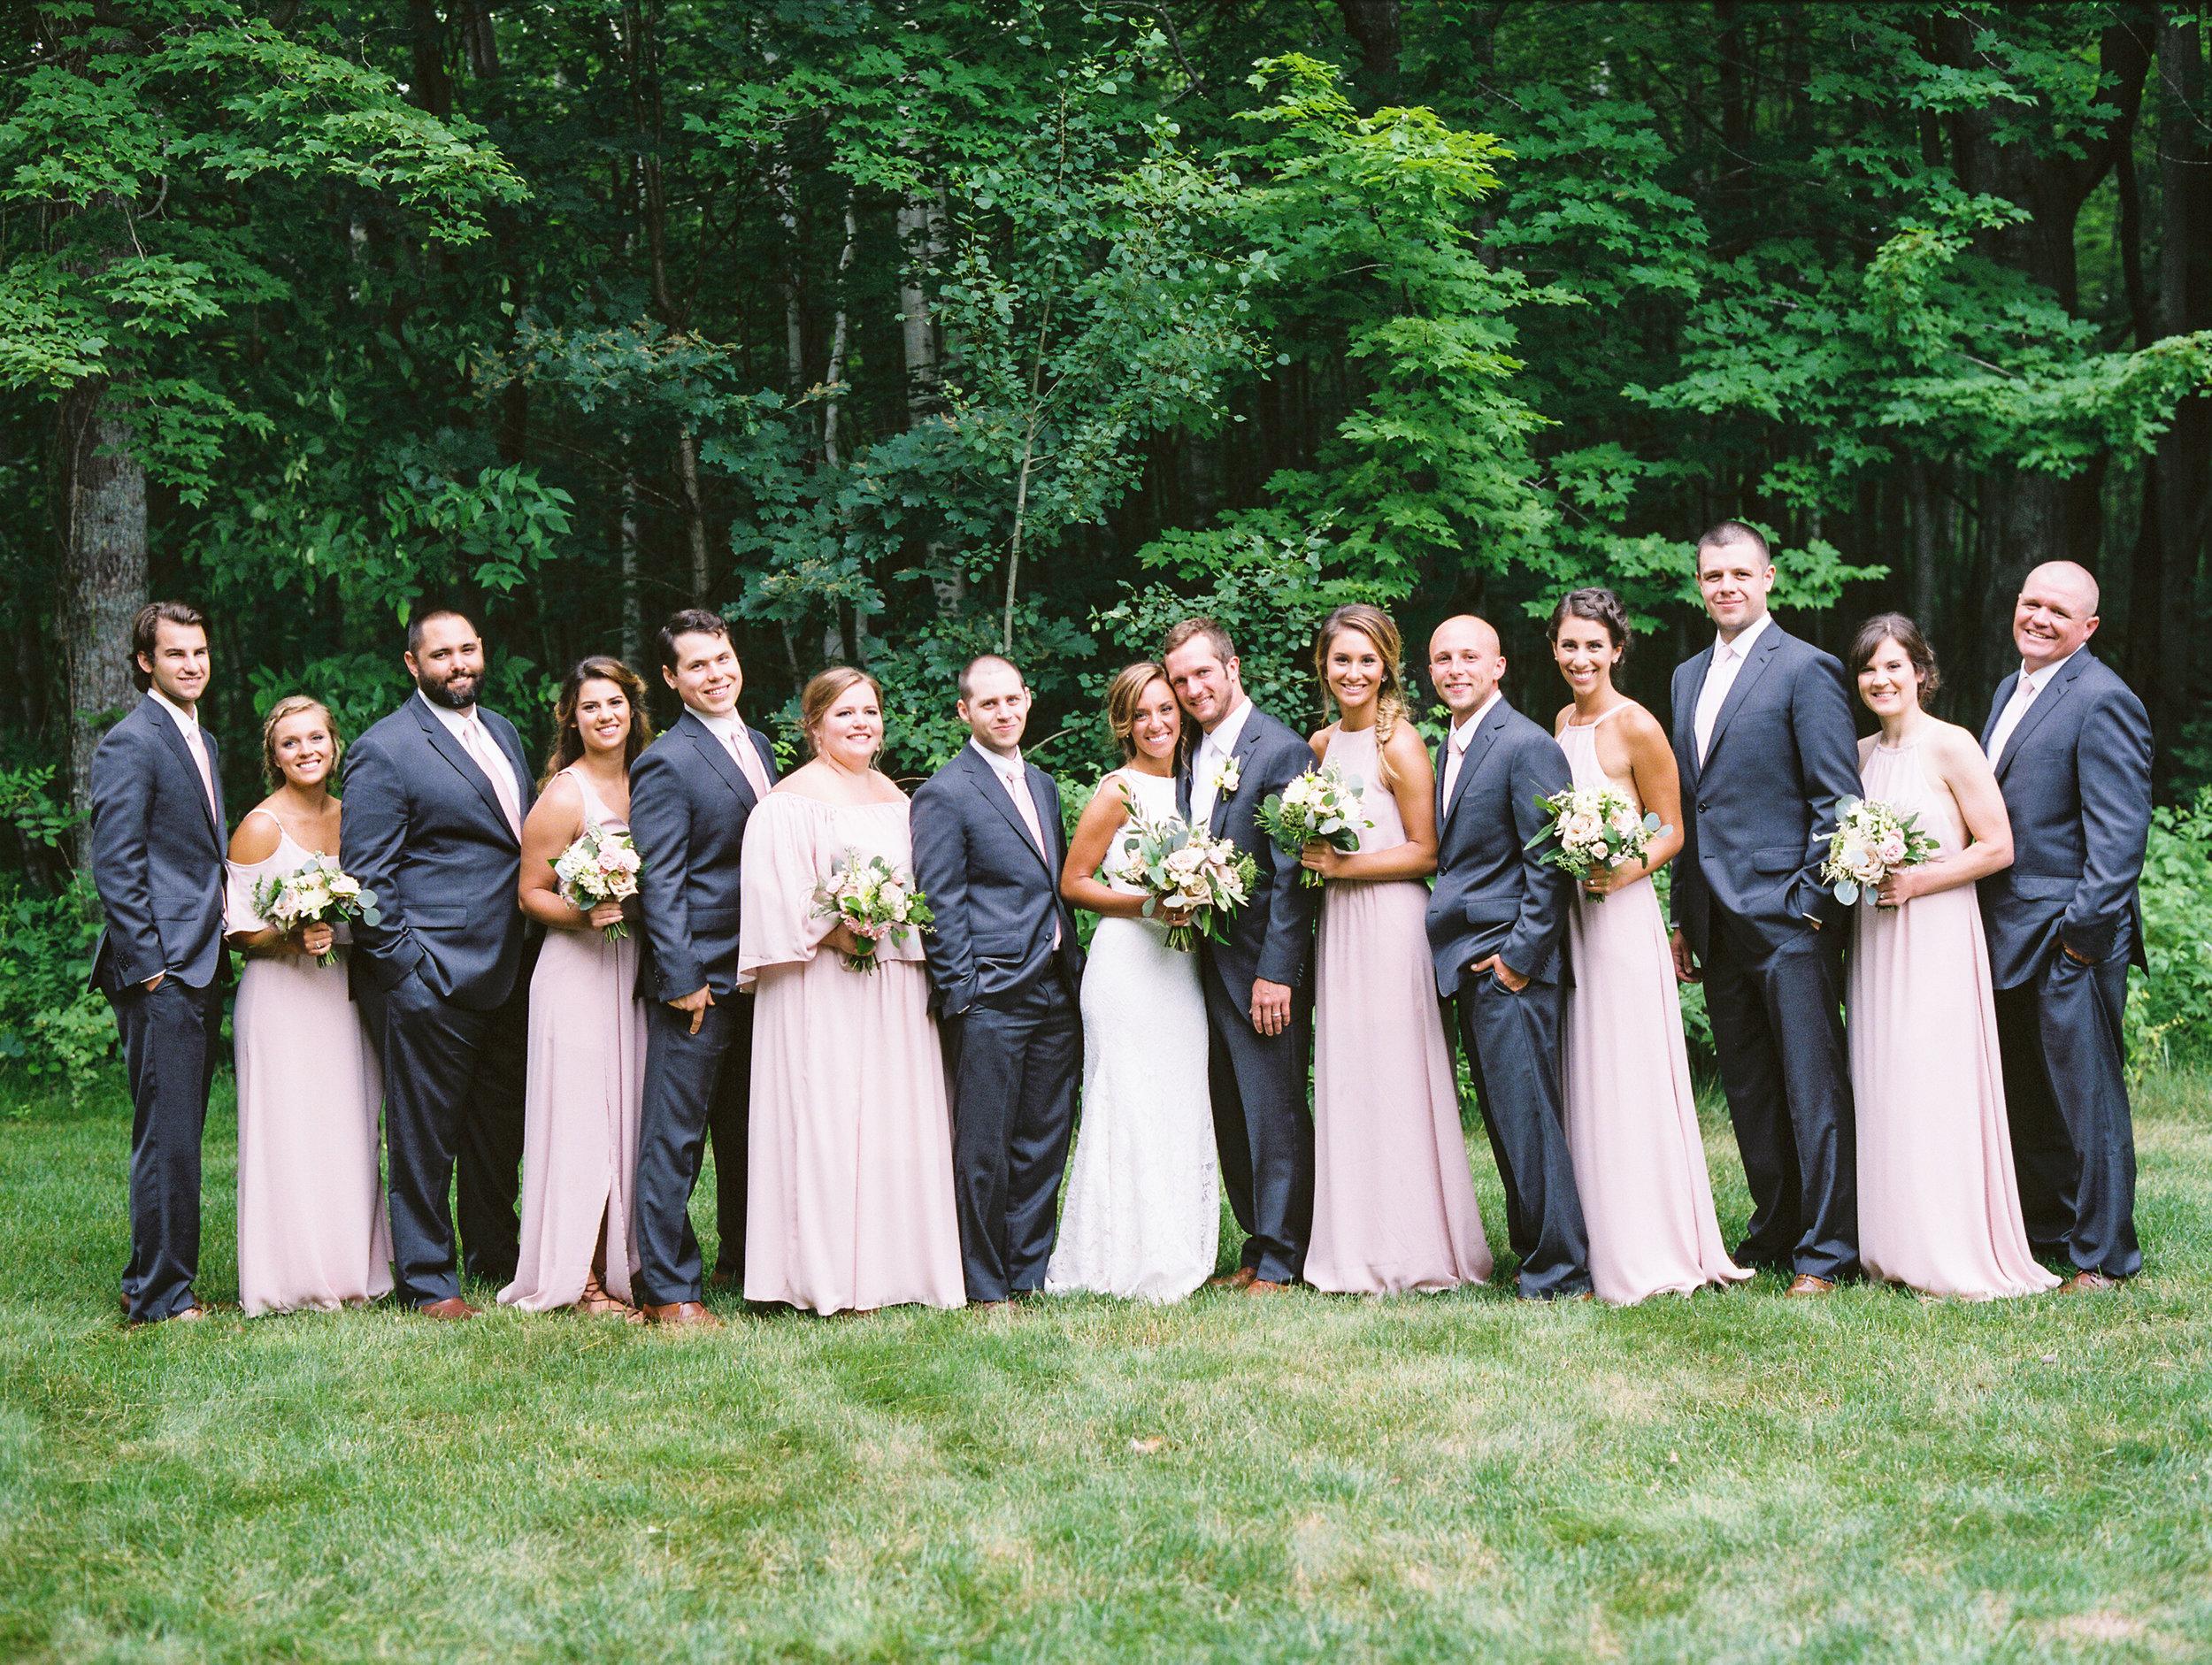 Stanley+Wedding+Bridal+Party-74.jpg